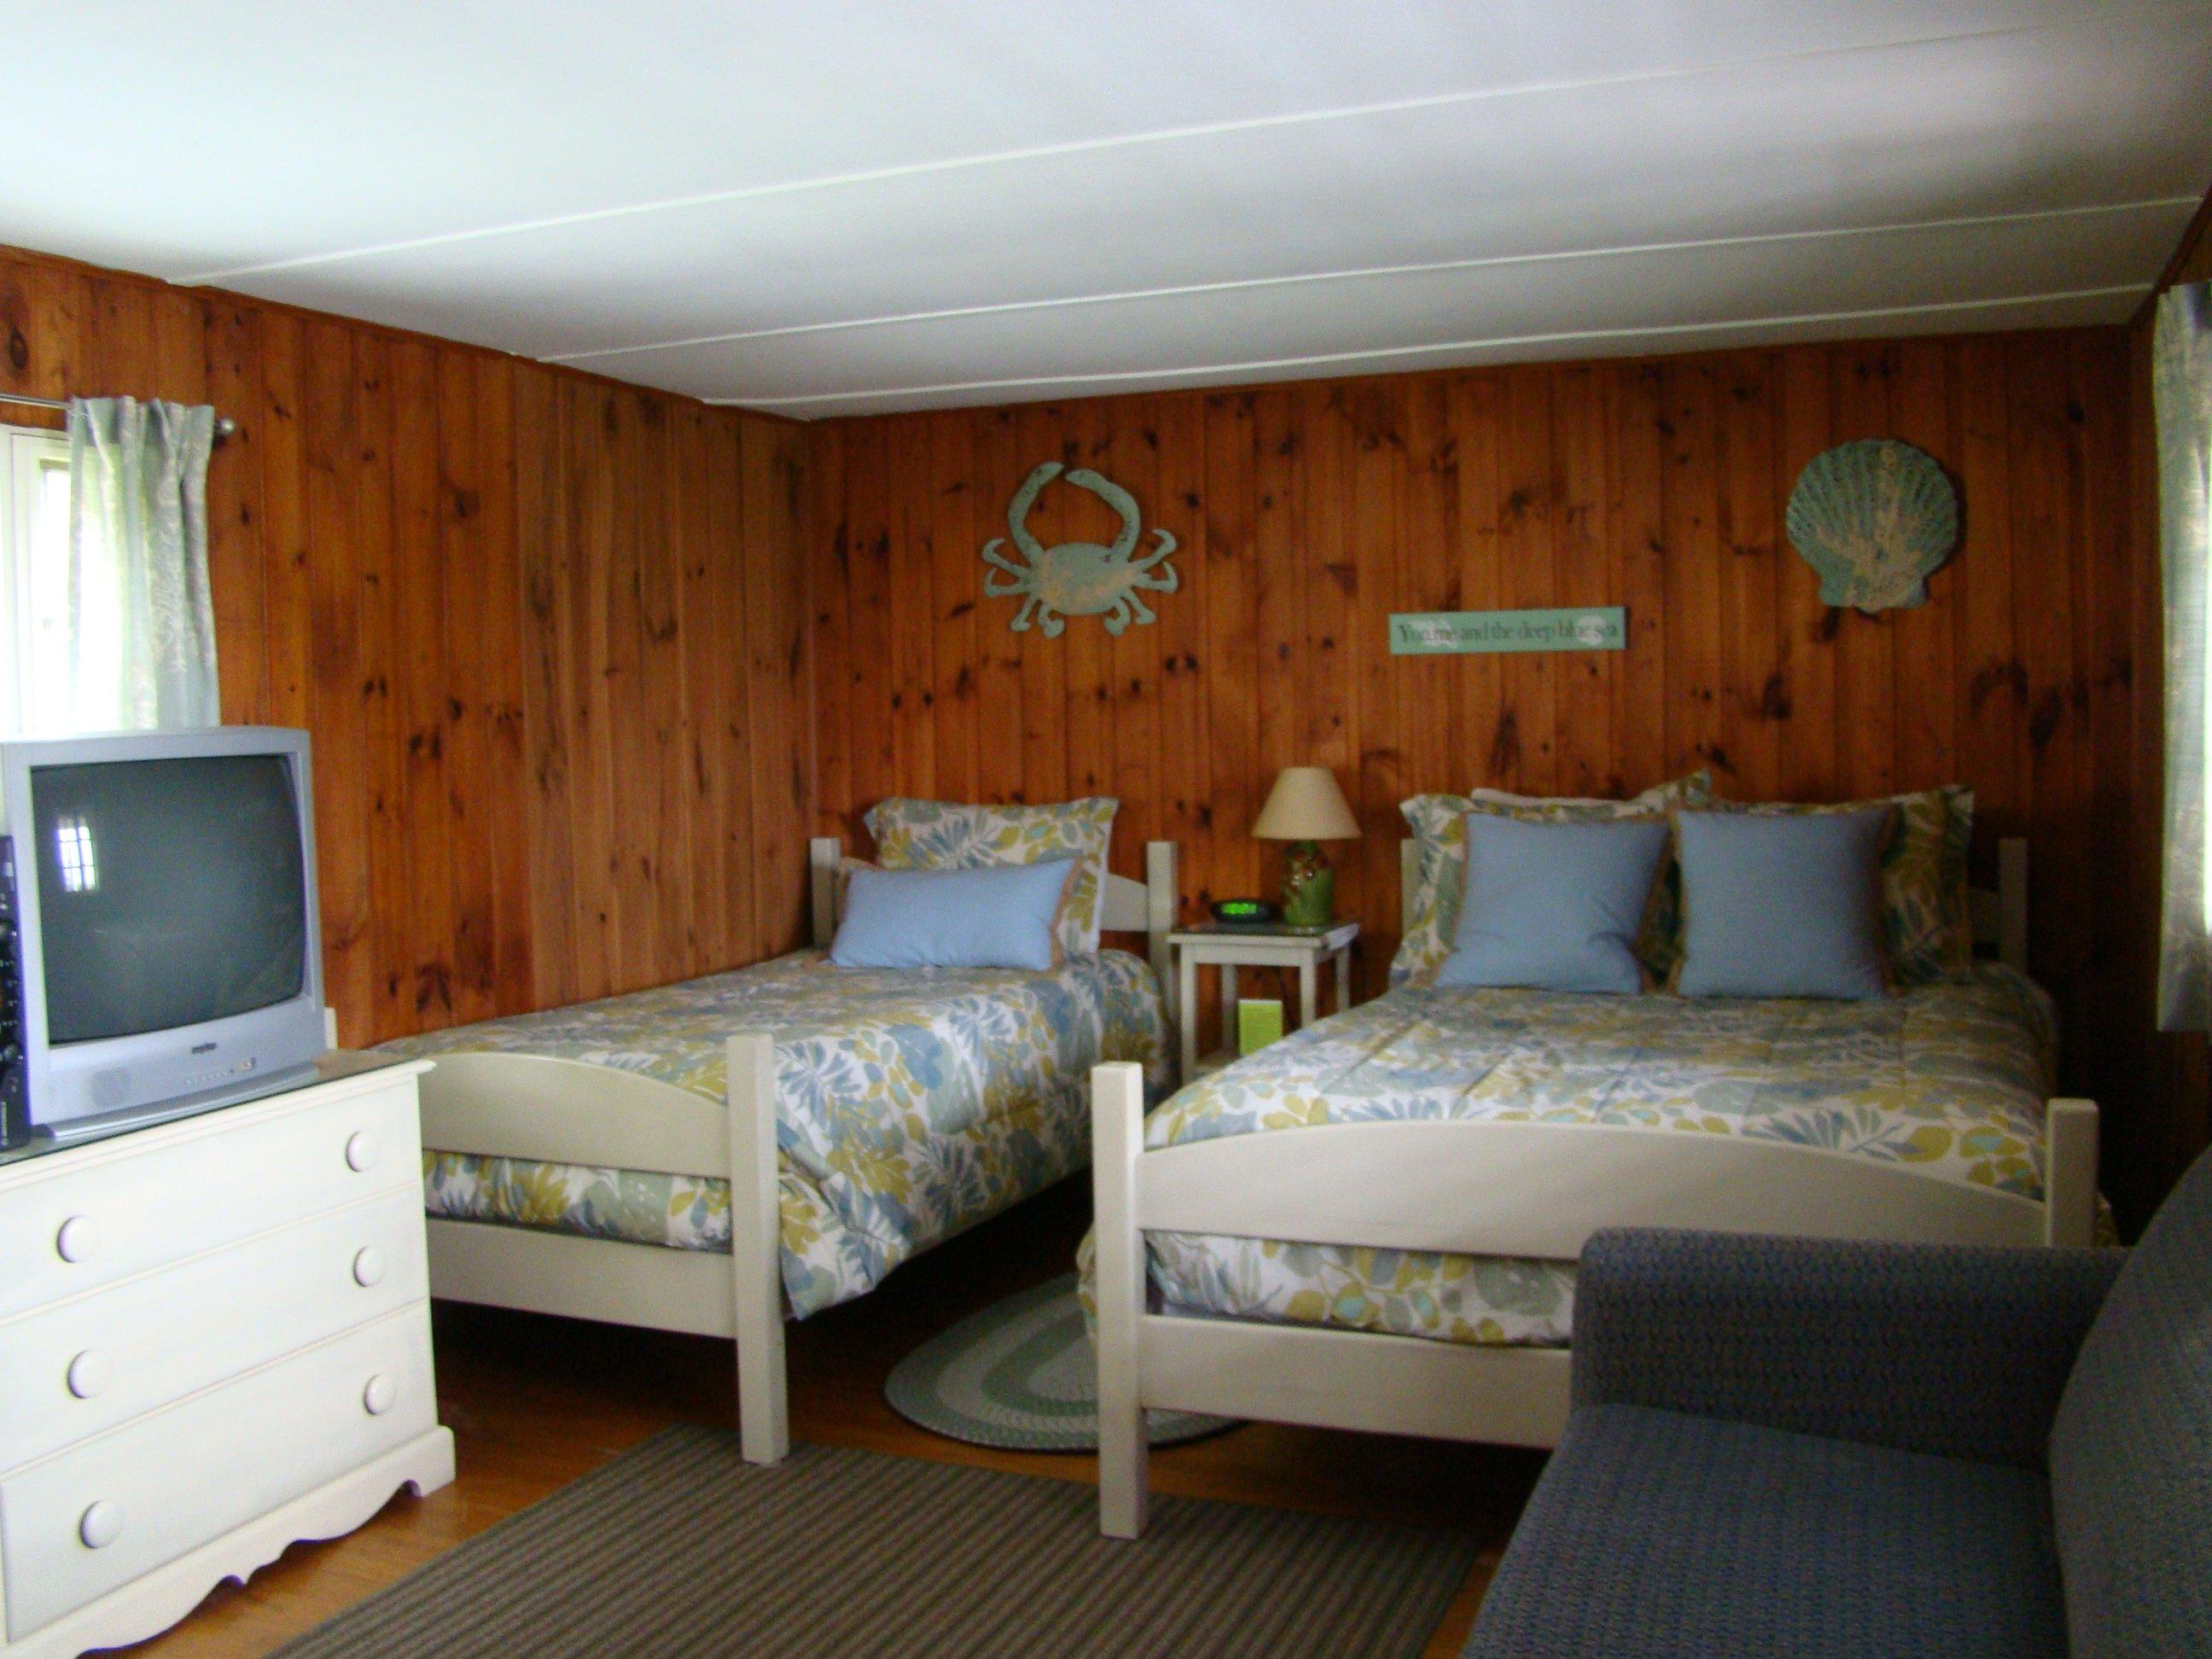 Motel room #14 - full bed, twin bed, full sleeper sofa, TV, refrigerator, microwave, coffeemaker